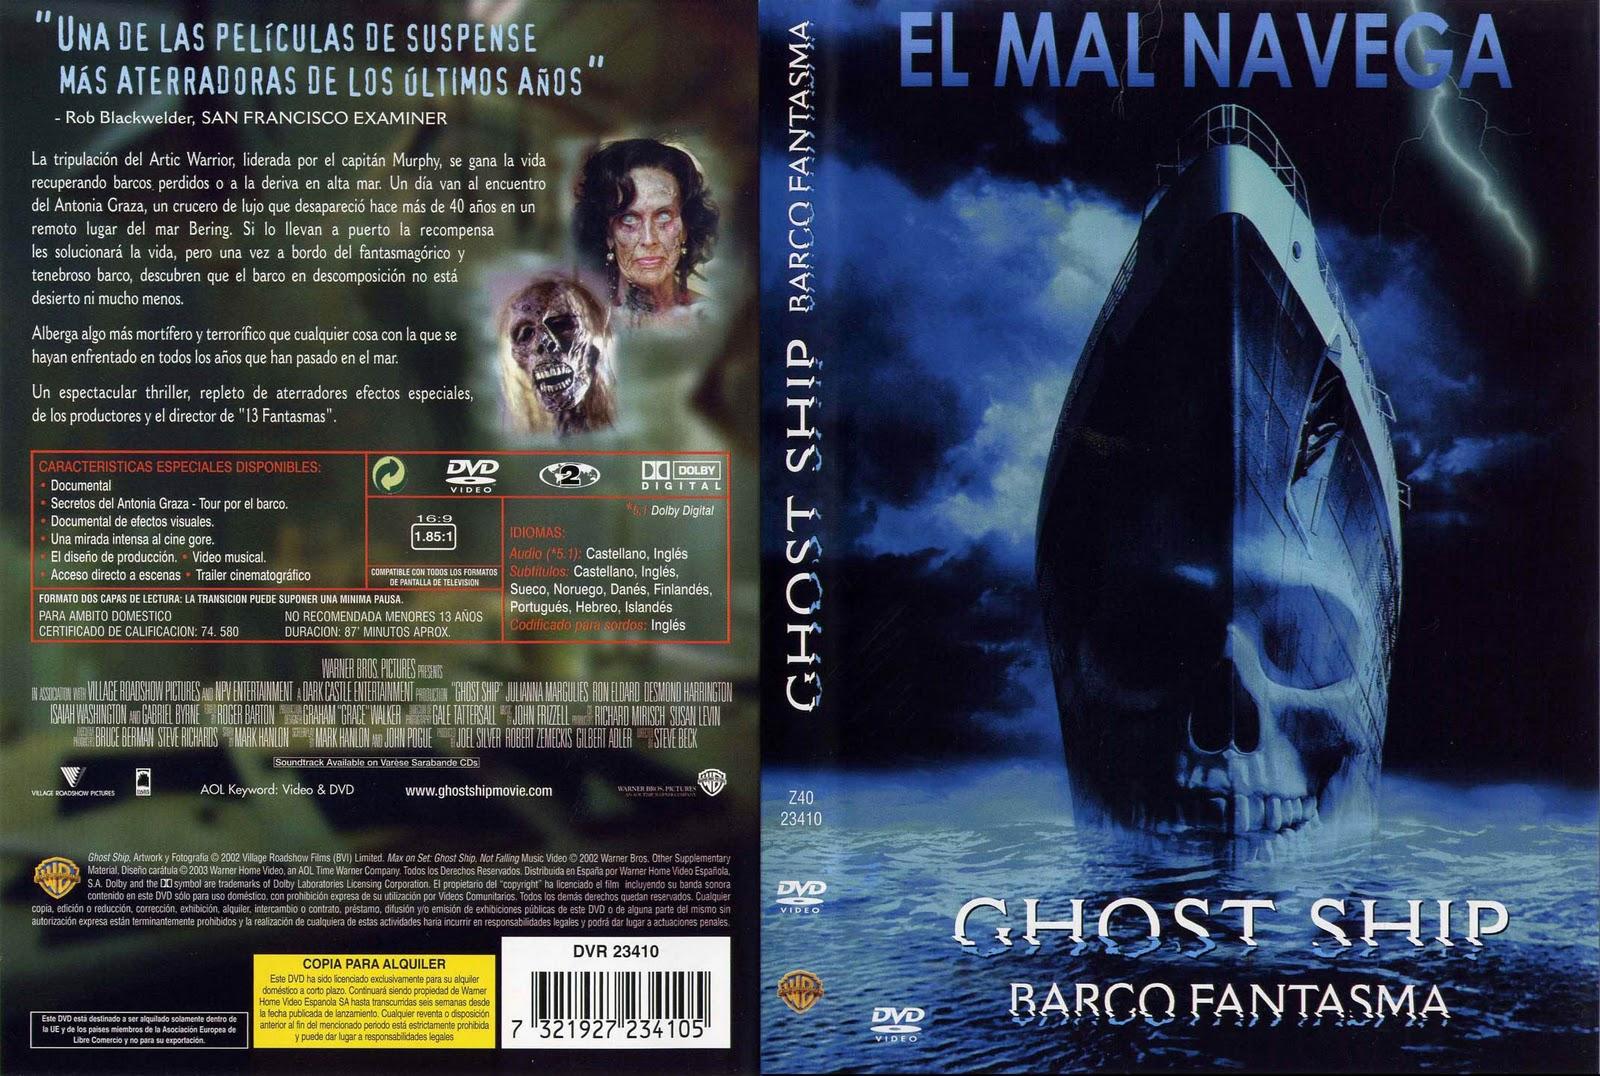 Barco Fantasma 2002 Peliculas Mundo